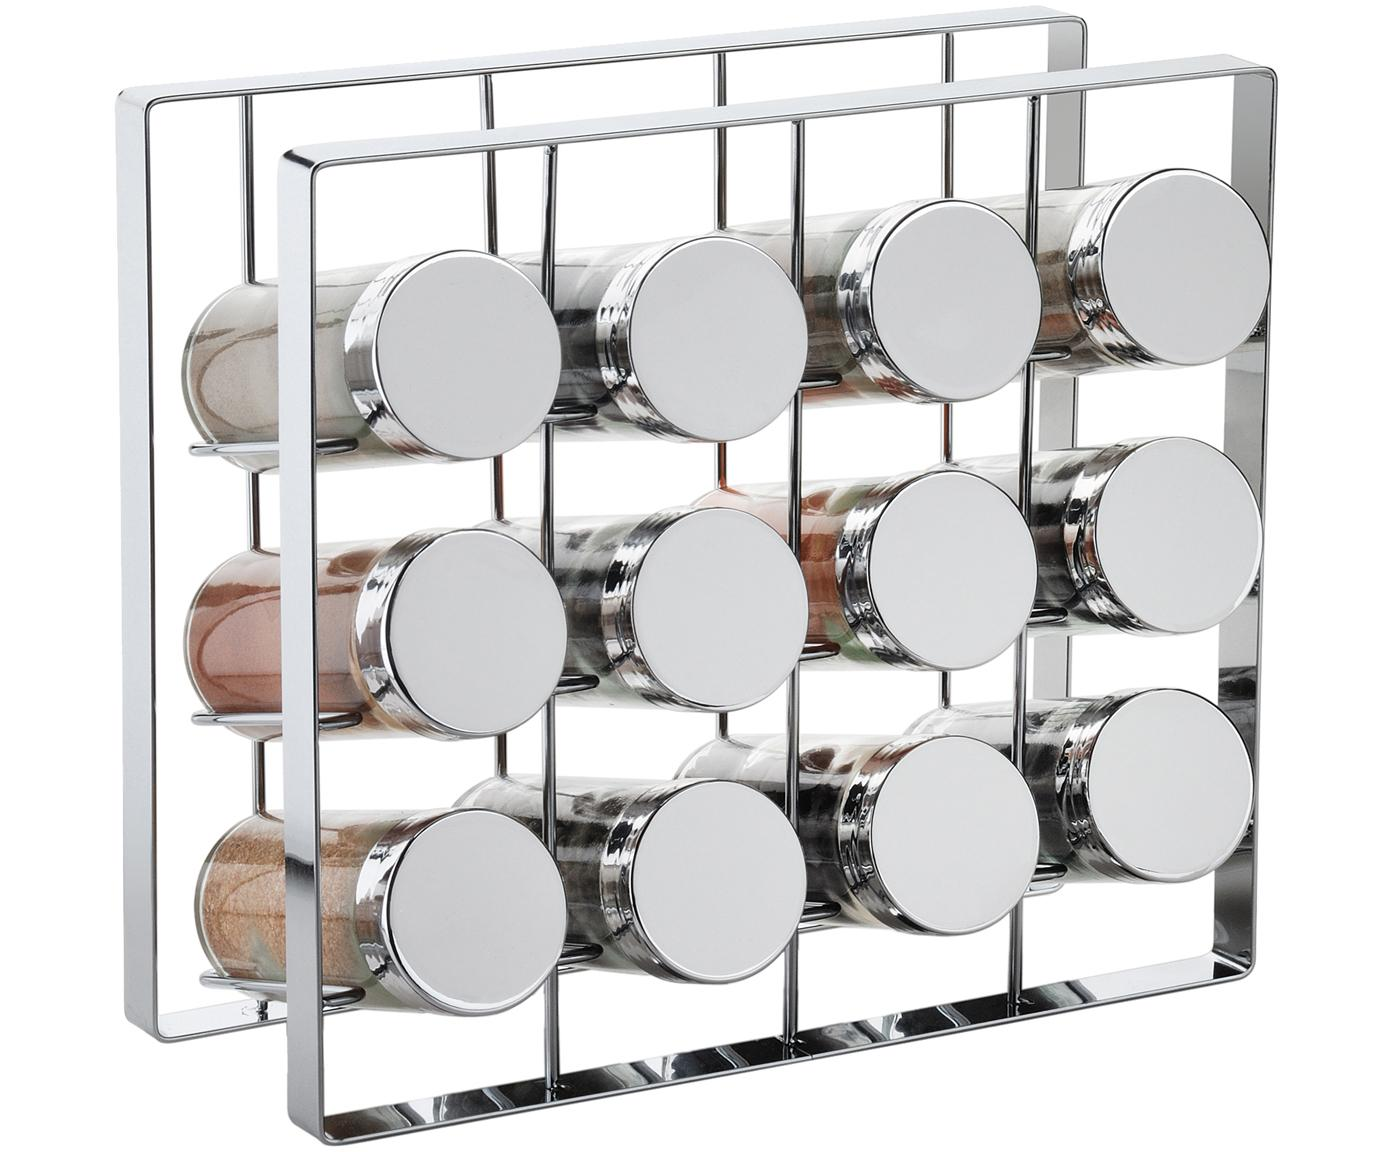 Kruidenrek Spices met opbergpotten, 13-delig, Frame: gelakt metaal, Sluiting: gelakt aluminium, Zilverkleurig, 24 x 22 cm